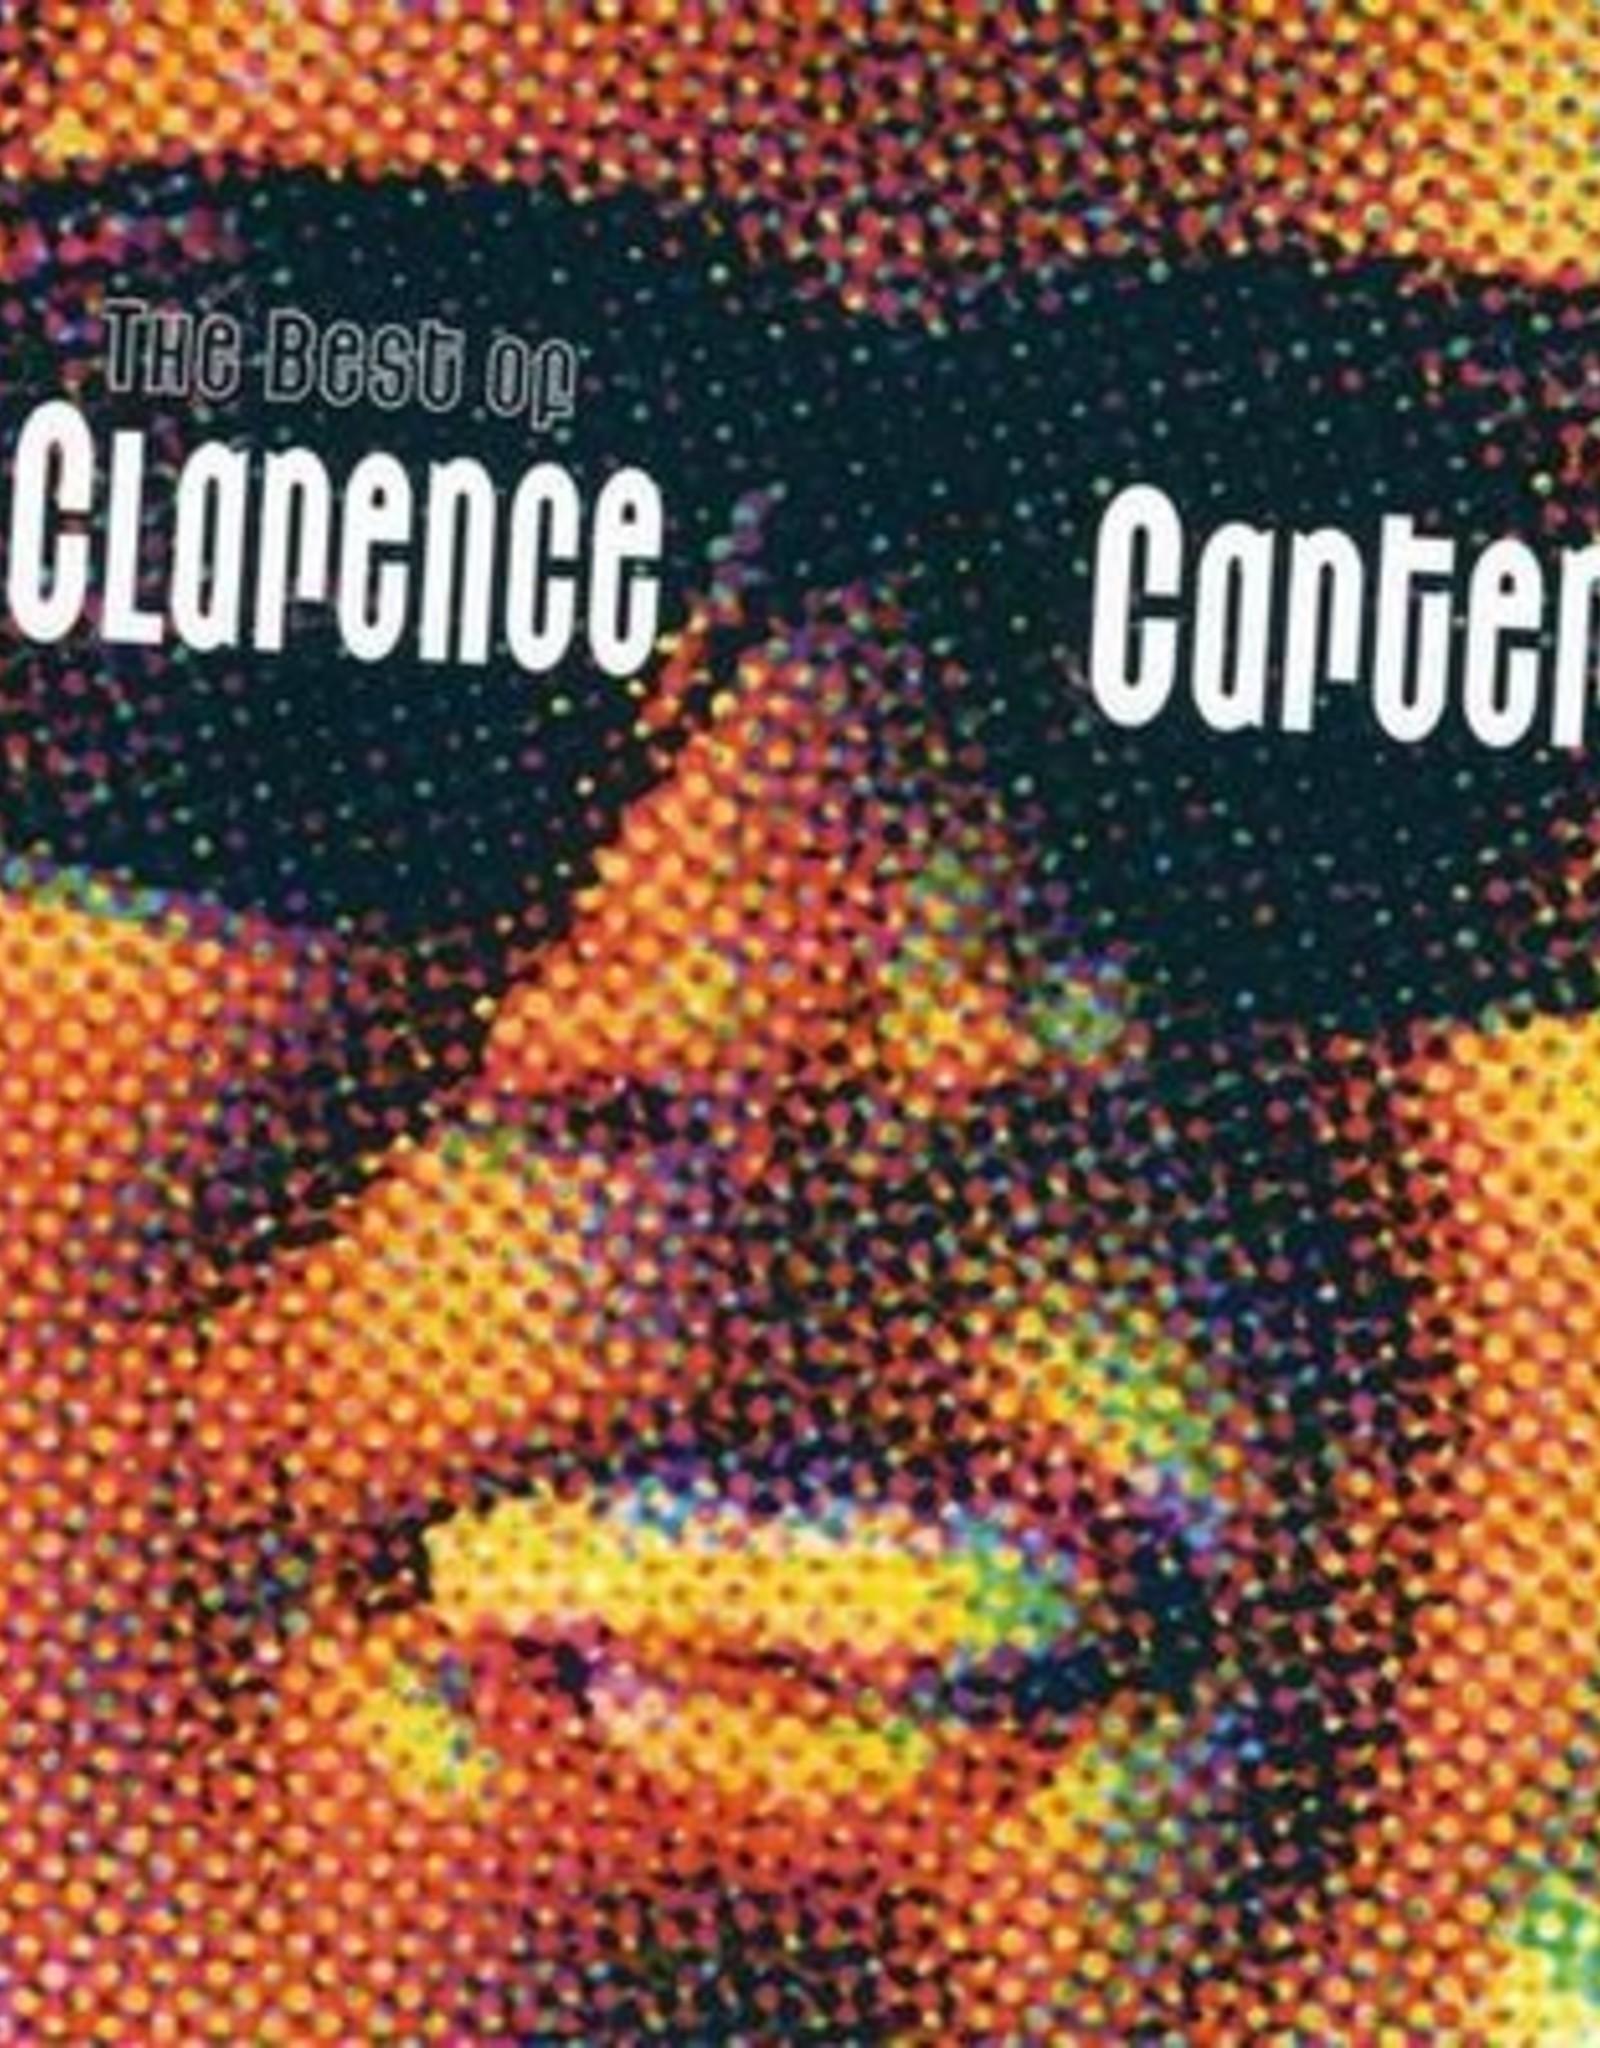 Clarence Carter - Best Of Clarence Carter (180 Gram)